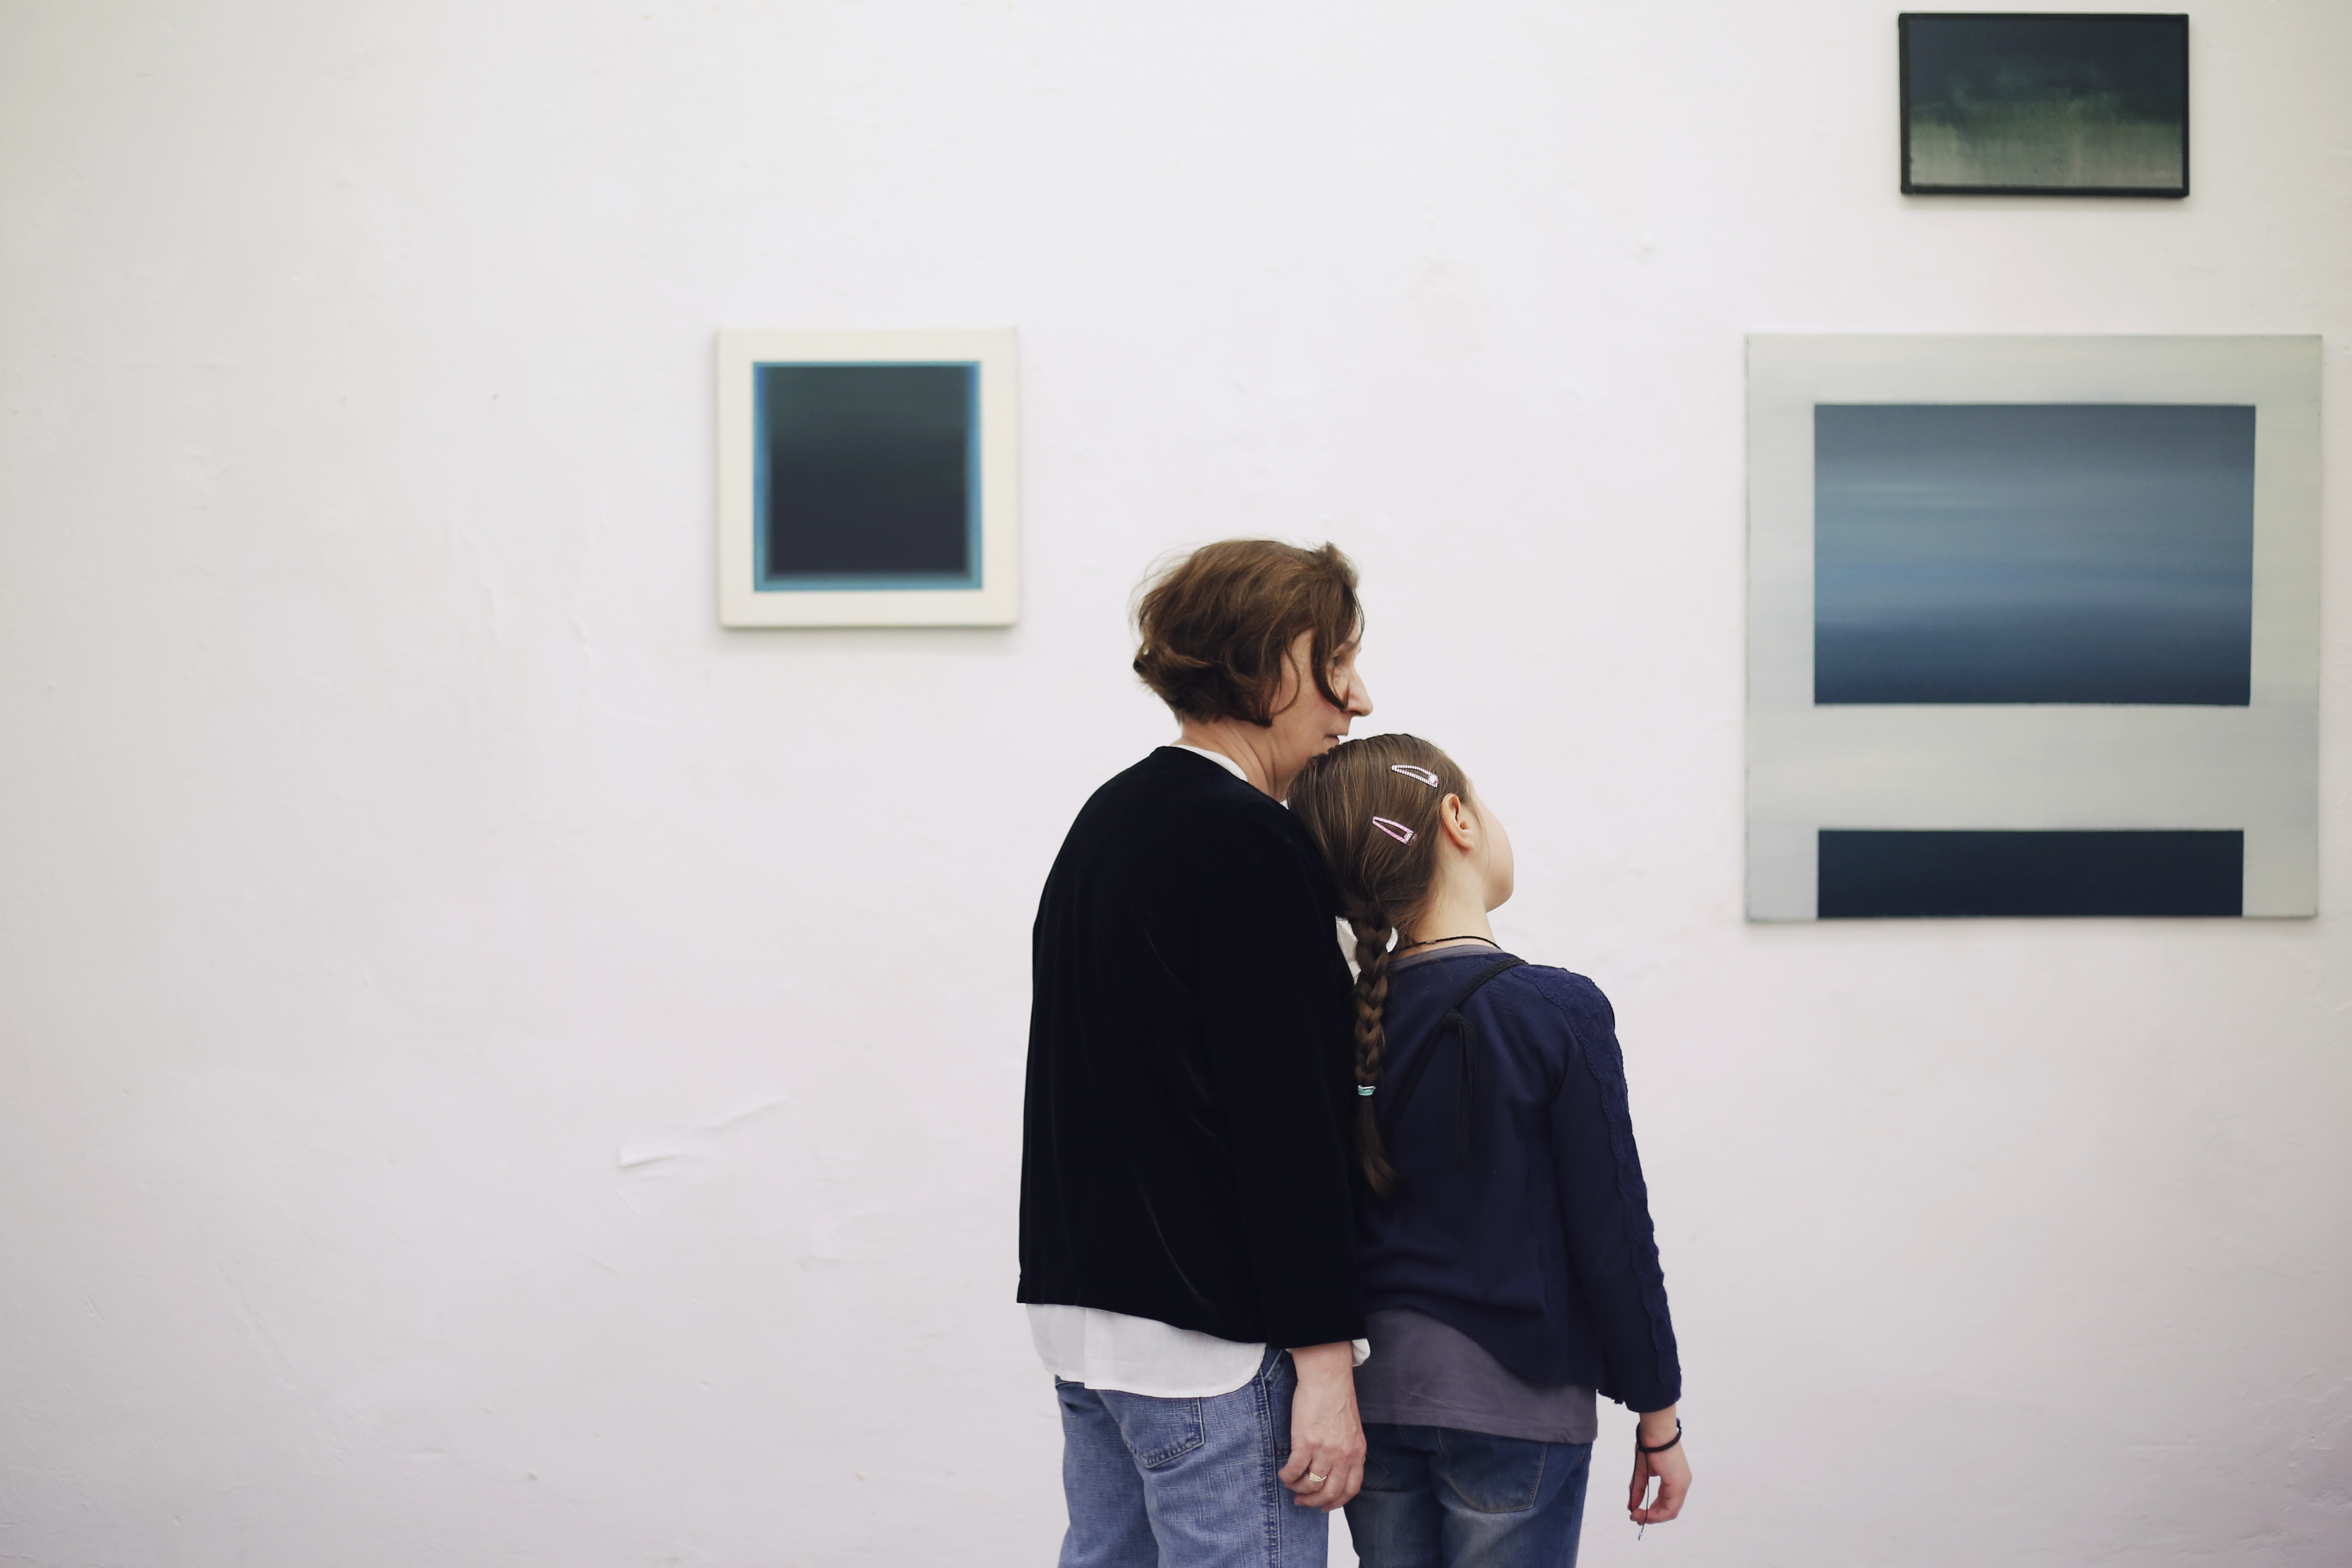 IV edycja Cracow Gallery Weekend Krakers  2015, Olga Pawłowska – 41° 04'N 141° 30'E,   Otwarta Pracownia, fot. Joanna Rytter